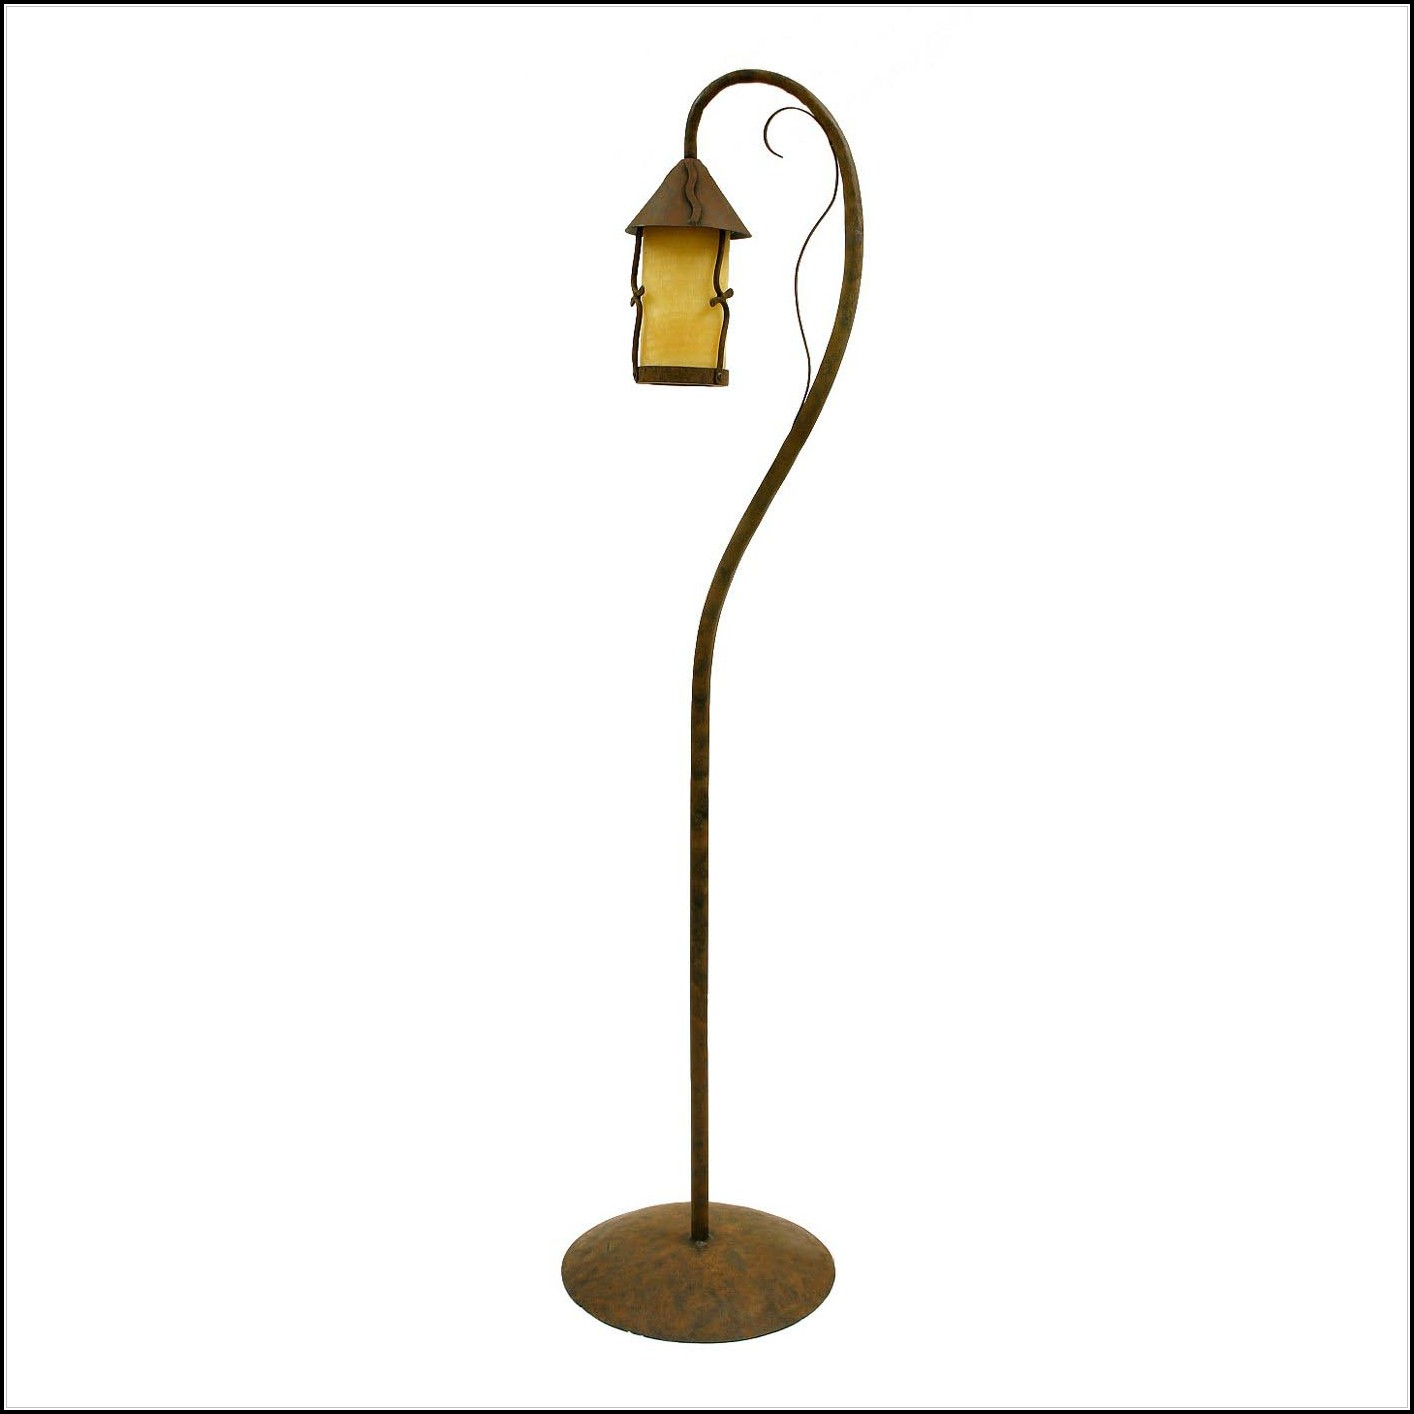 Wrought Iron Floor Lamp Rustic